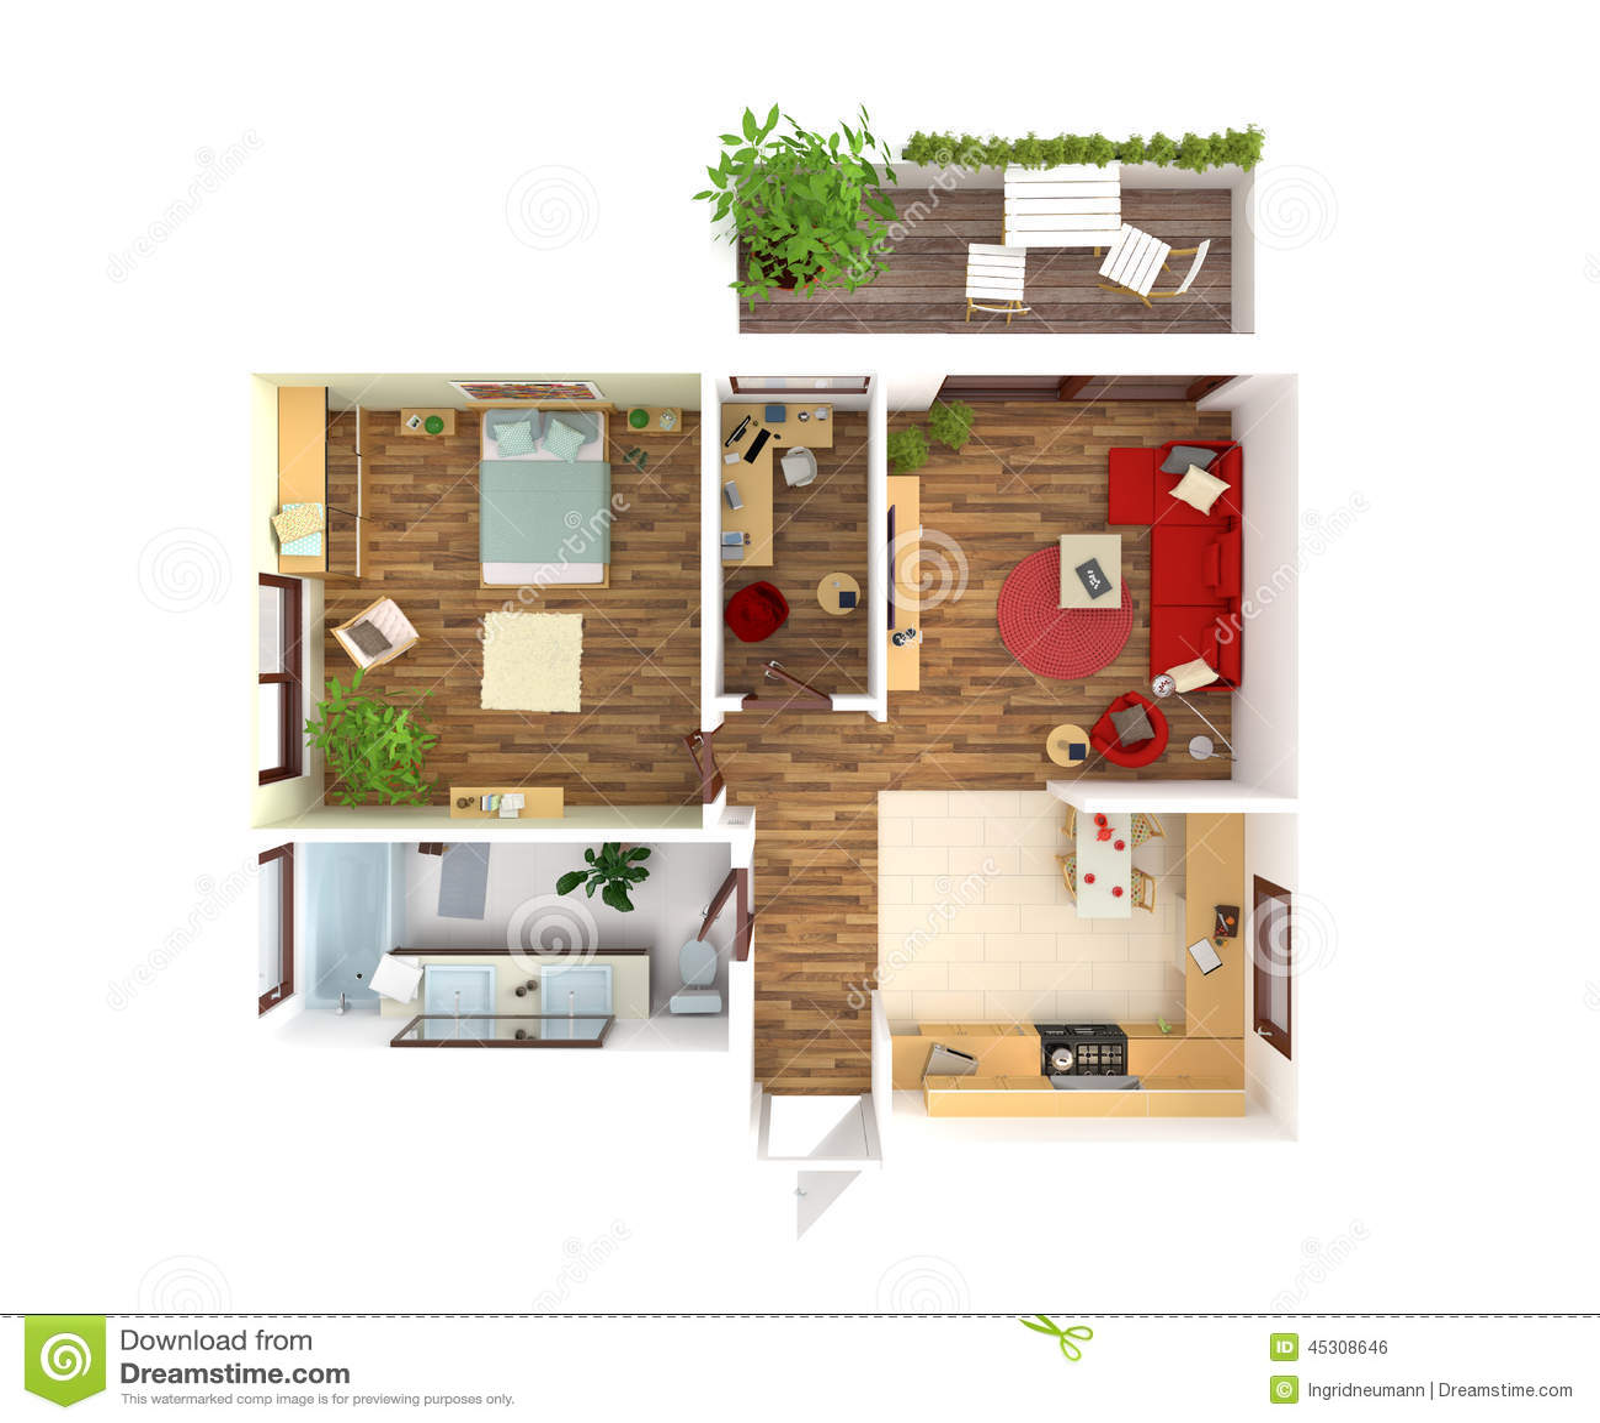 13 Superb Modern Living Room With Pool Ideas That Will: De Hoogste Mening Van Het Huisplan